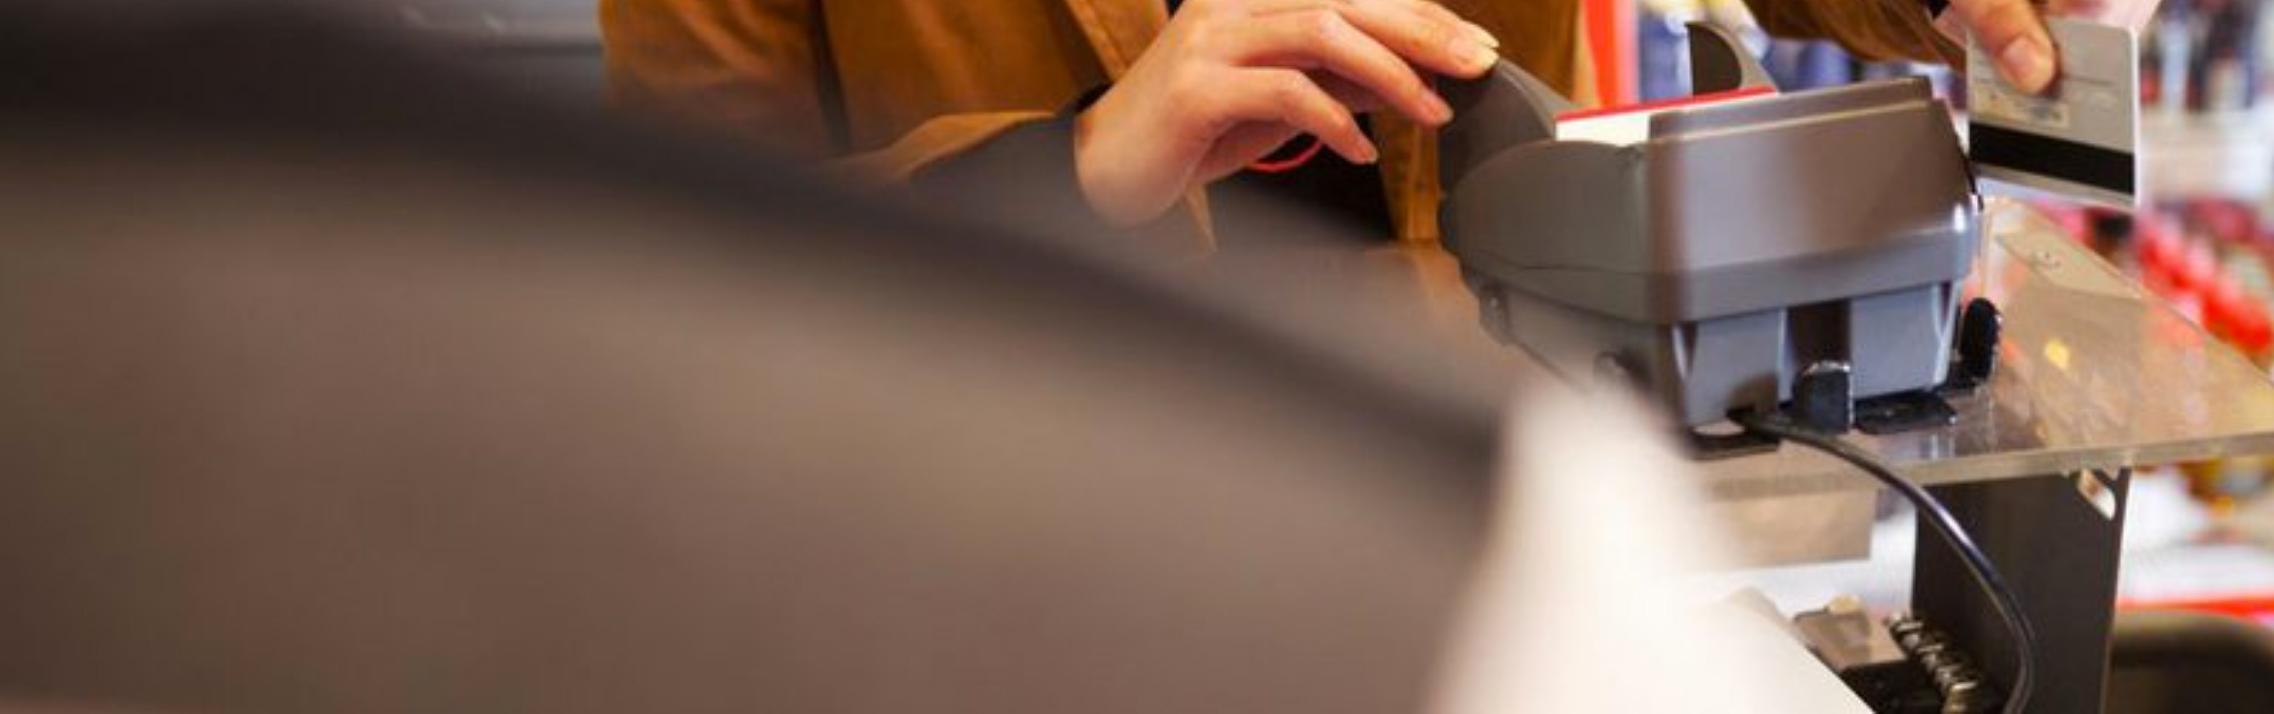 criminal defense attorney dallas, non-subscriber injury attorney dallas, entertainment law lawyer